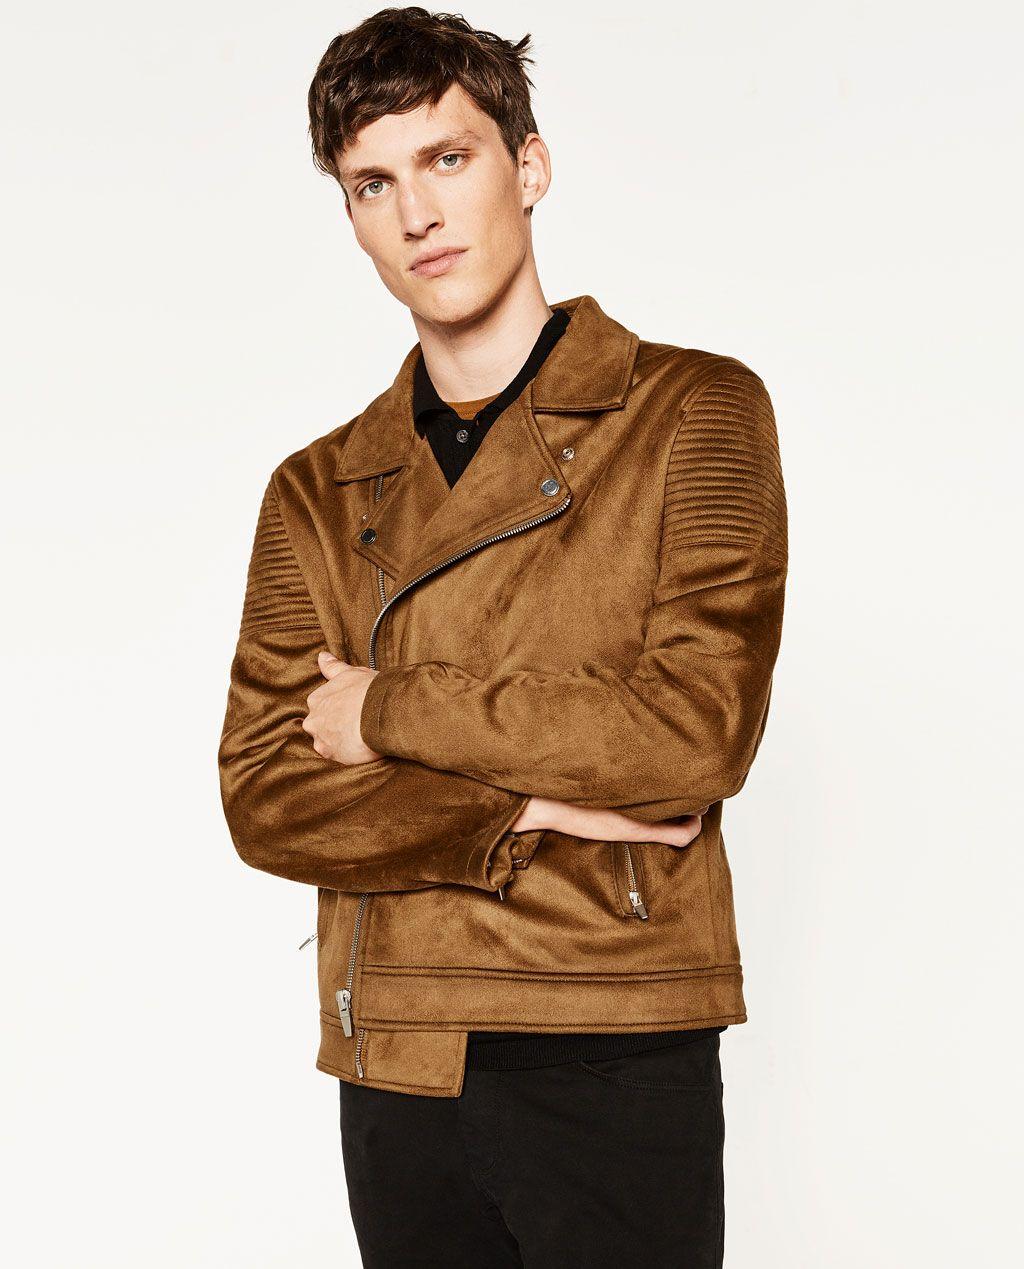 Zara Man Faux Suede Jacket Faux Suede Jacket Suede Jacket Zara Man